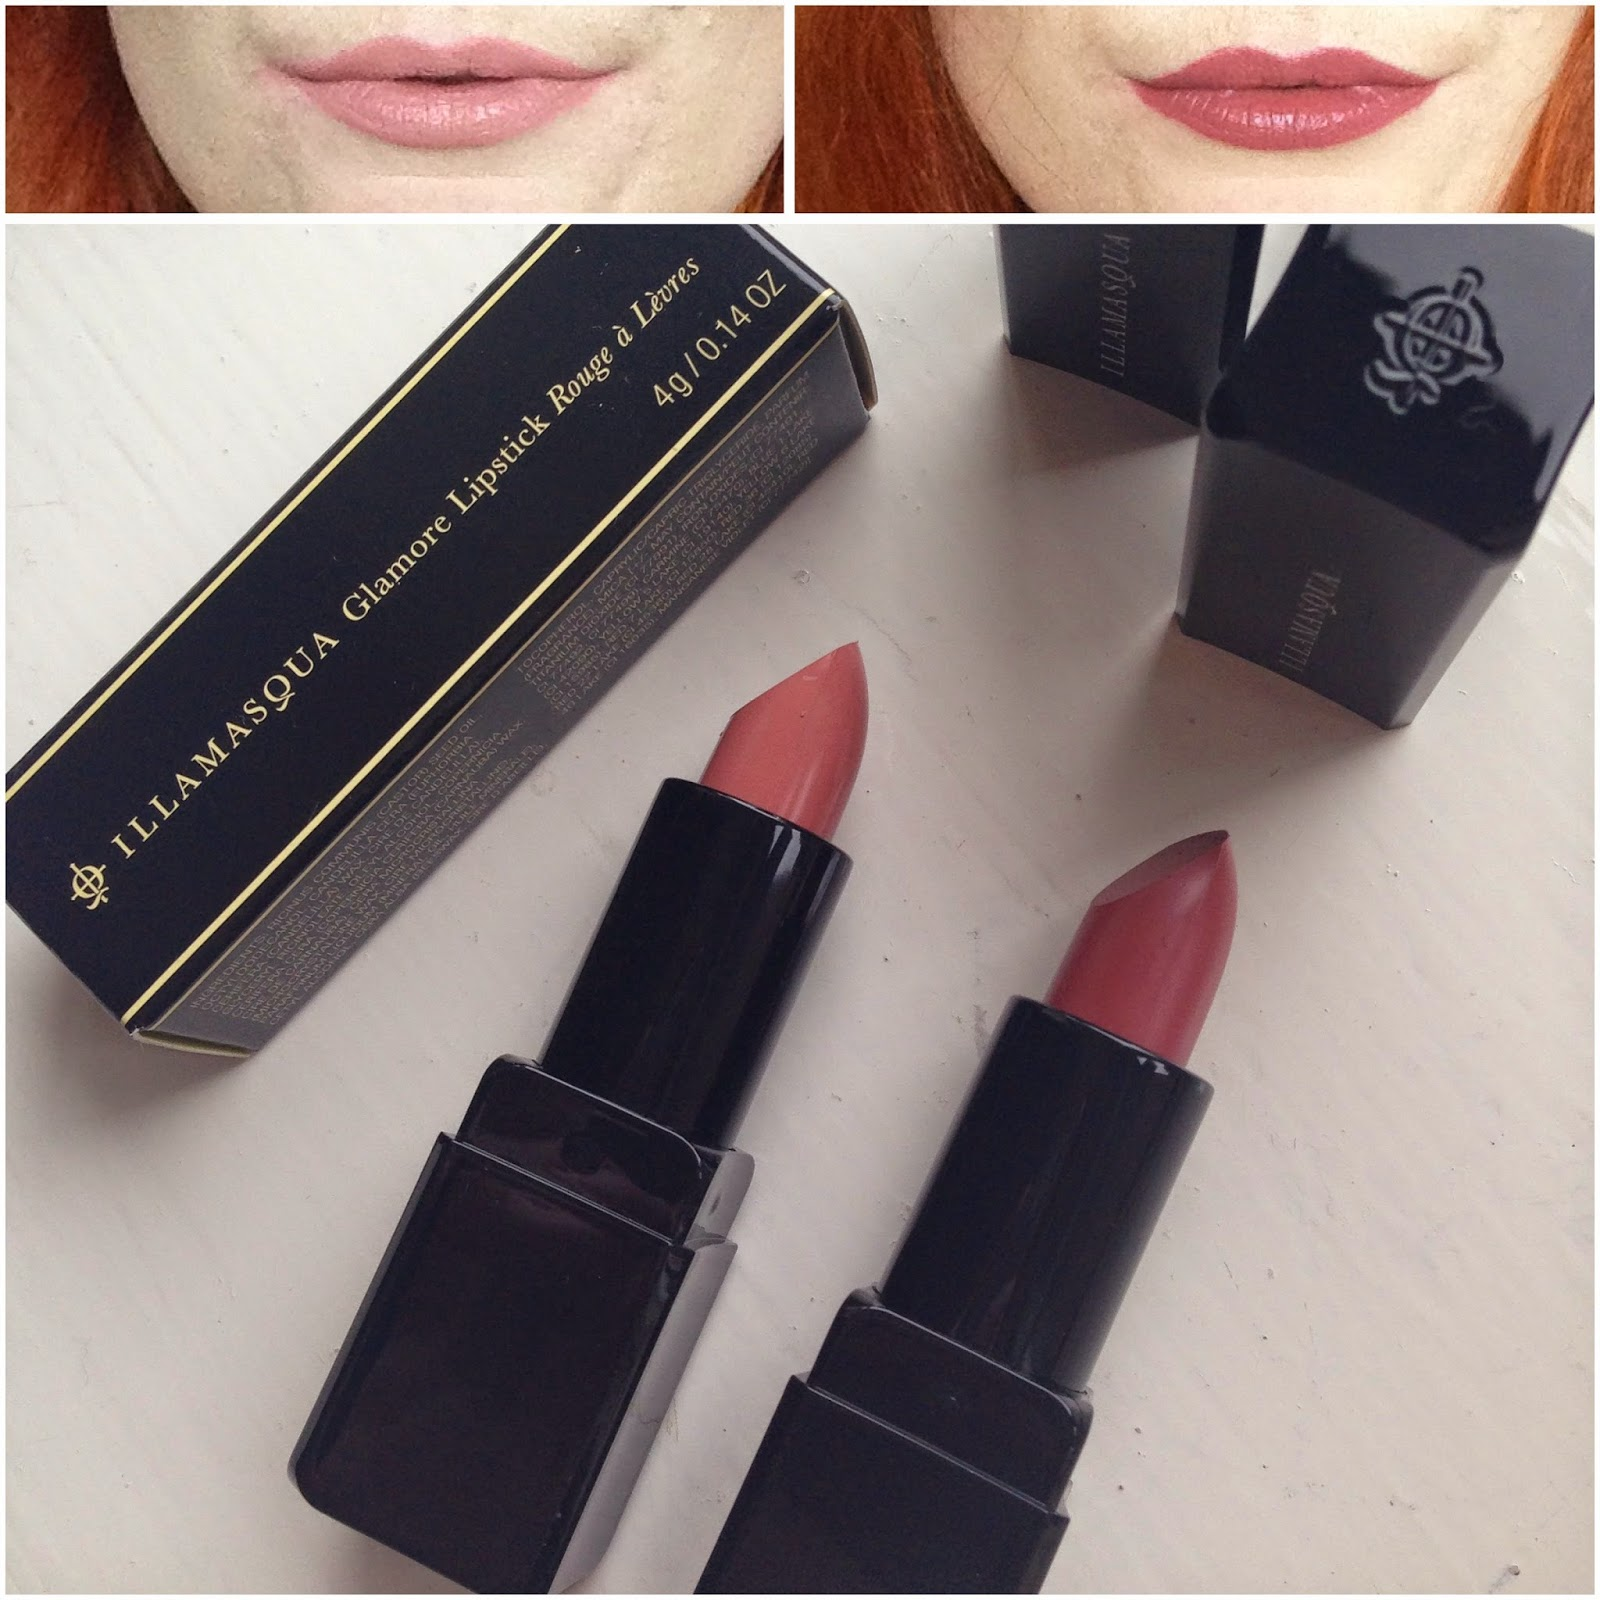 Illamasqua Glamore Nudes Lipstick Minx Rosepout Swatch